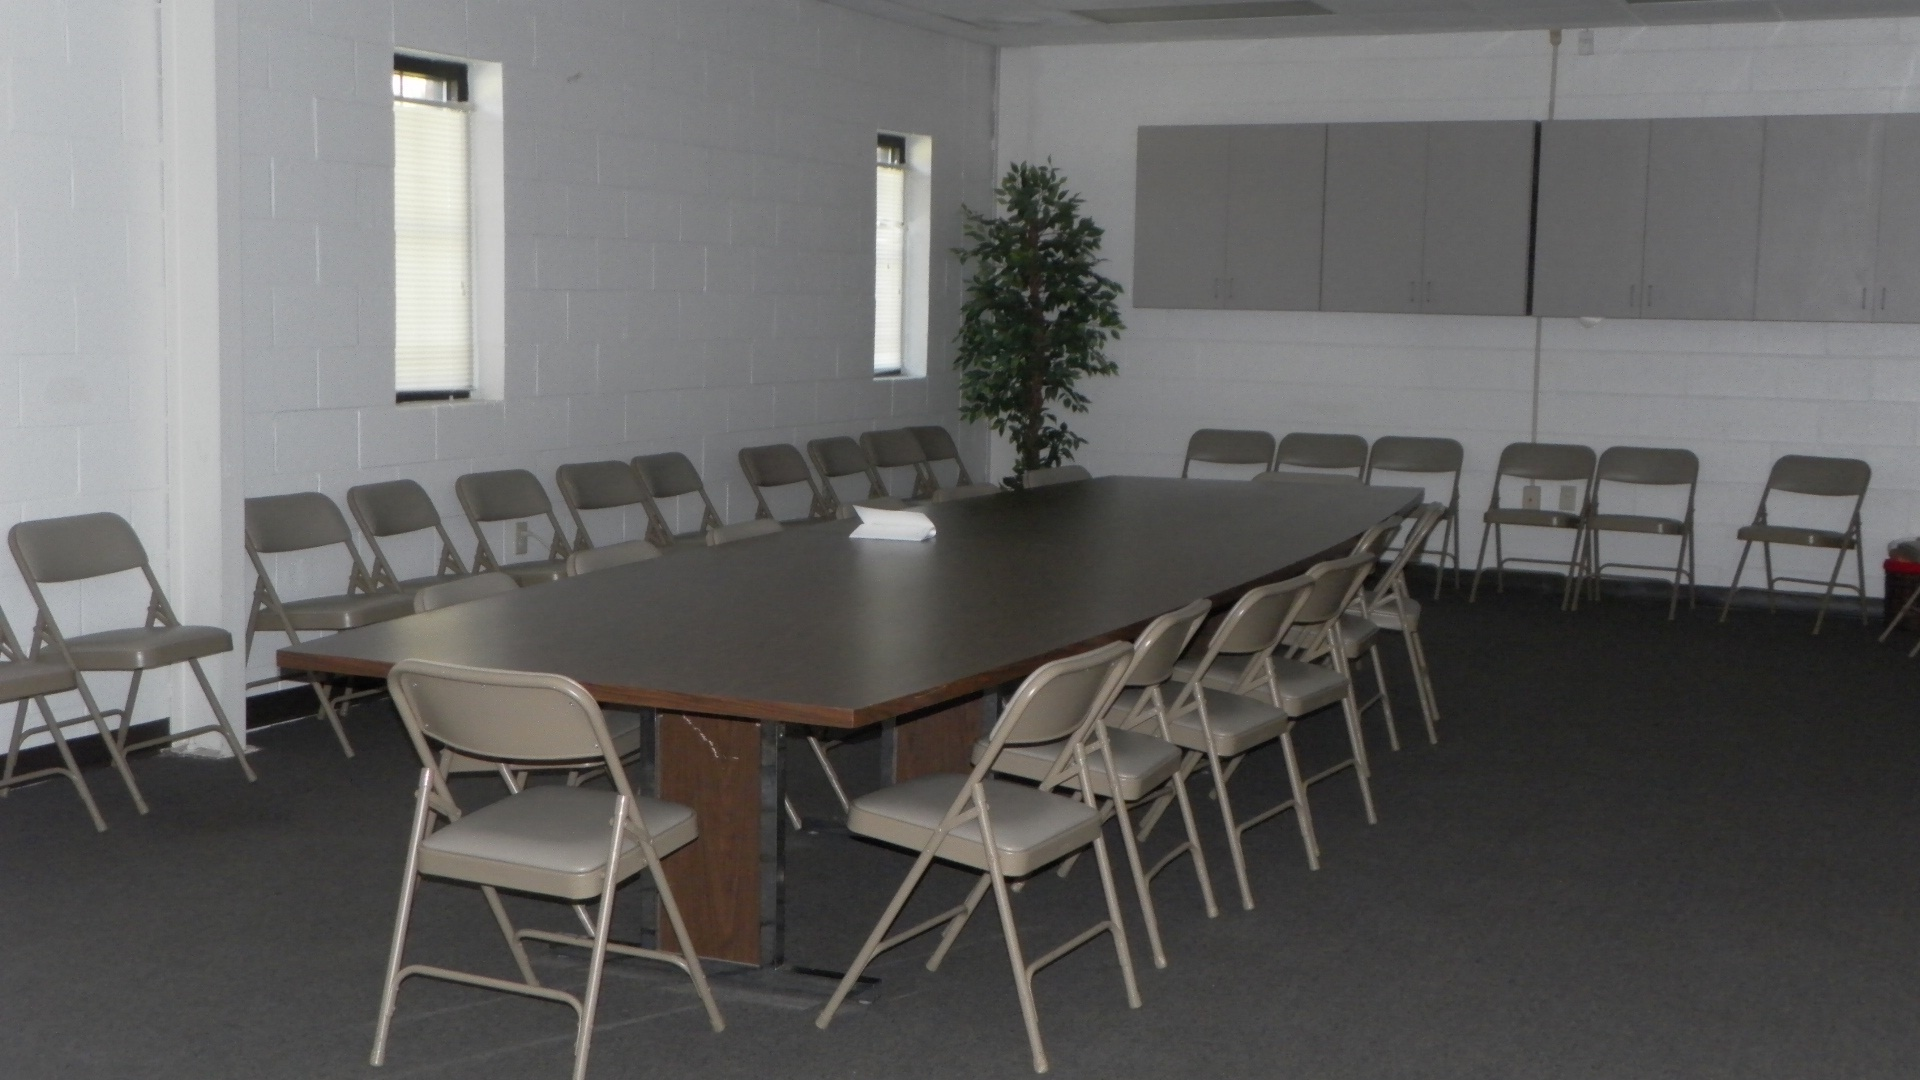 https://0201.nccdn.net/1_2/000/000/131/8e2/conference-room-1920x1080.jpg